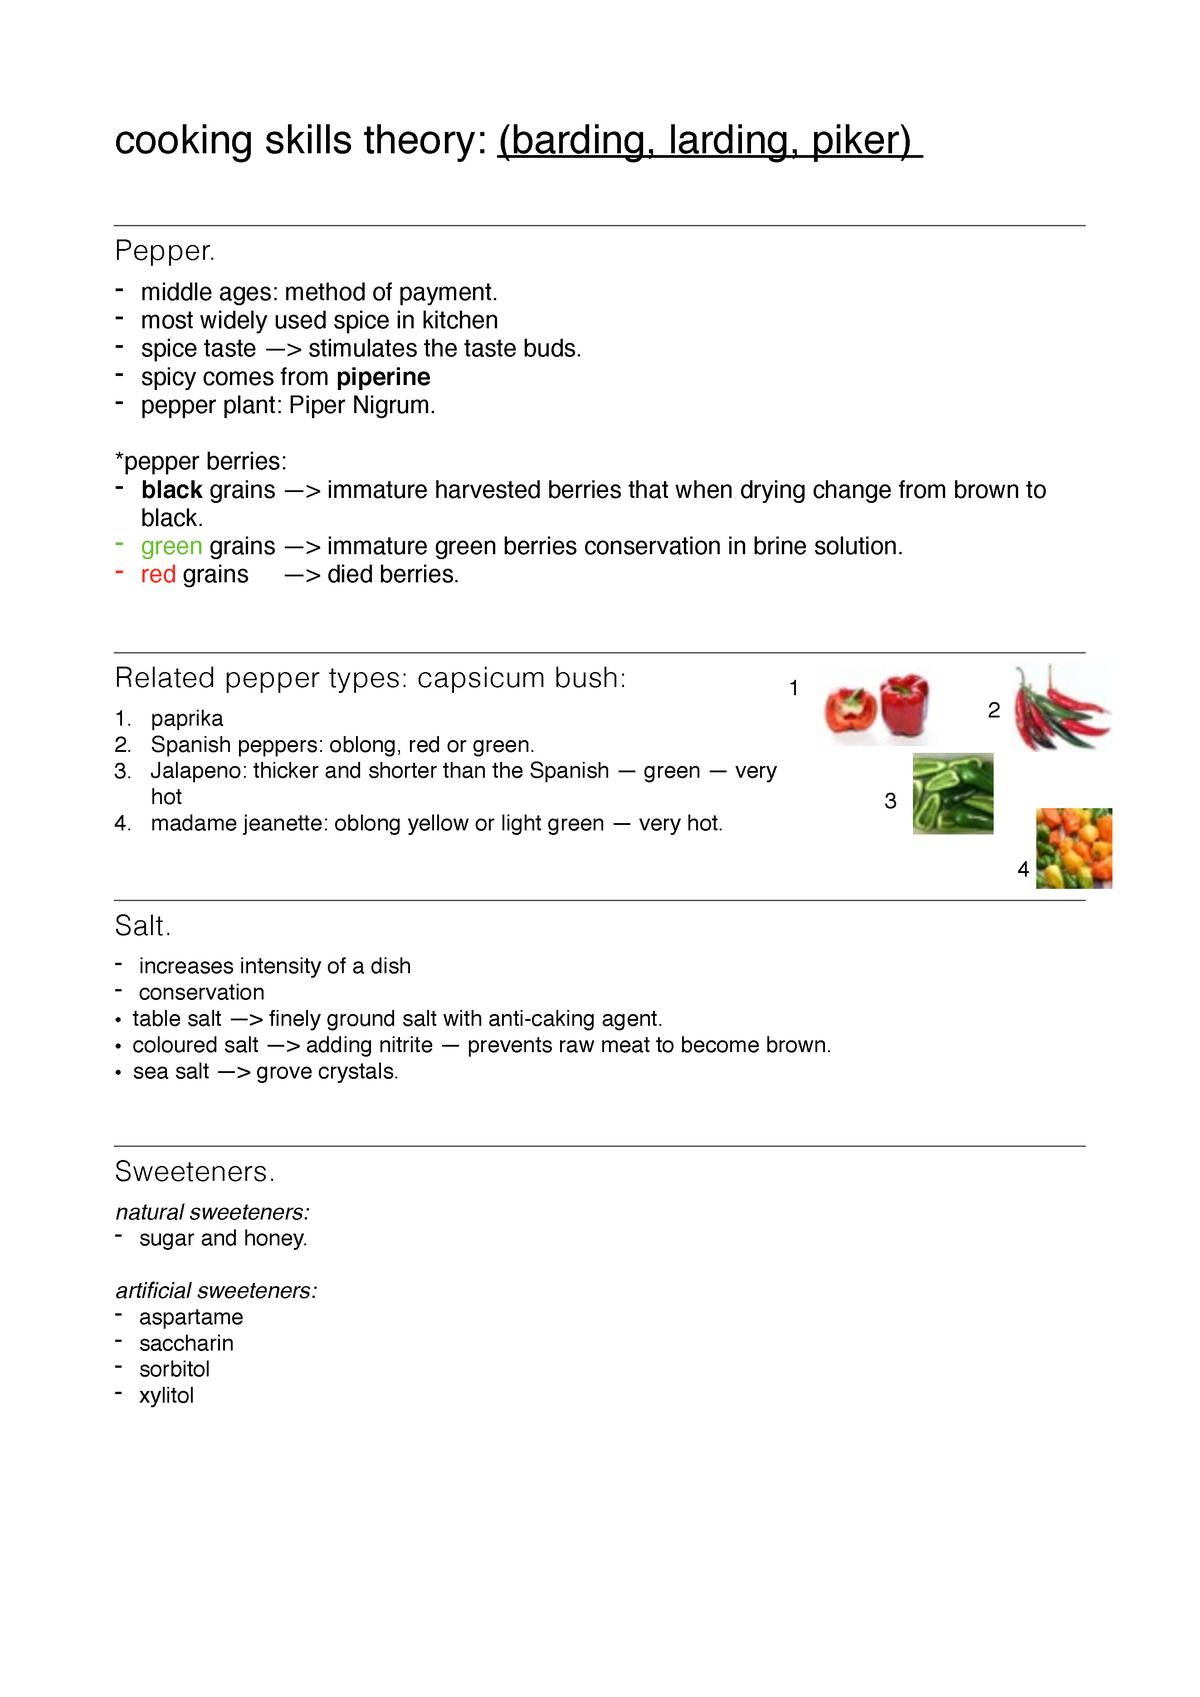 Tentamenweek KOKE - Cooking Skills Theory KOKE 1 2 - StuDocu